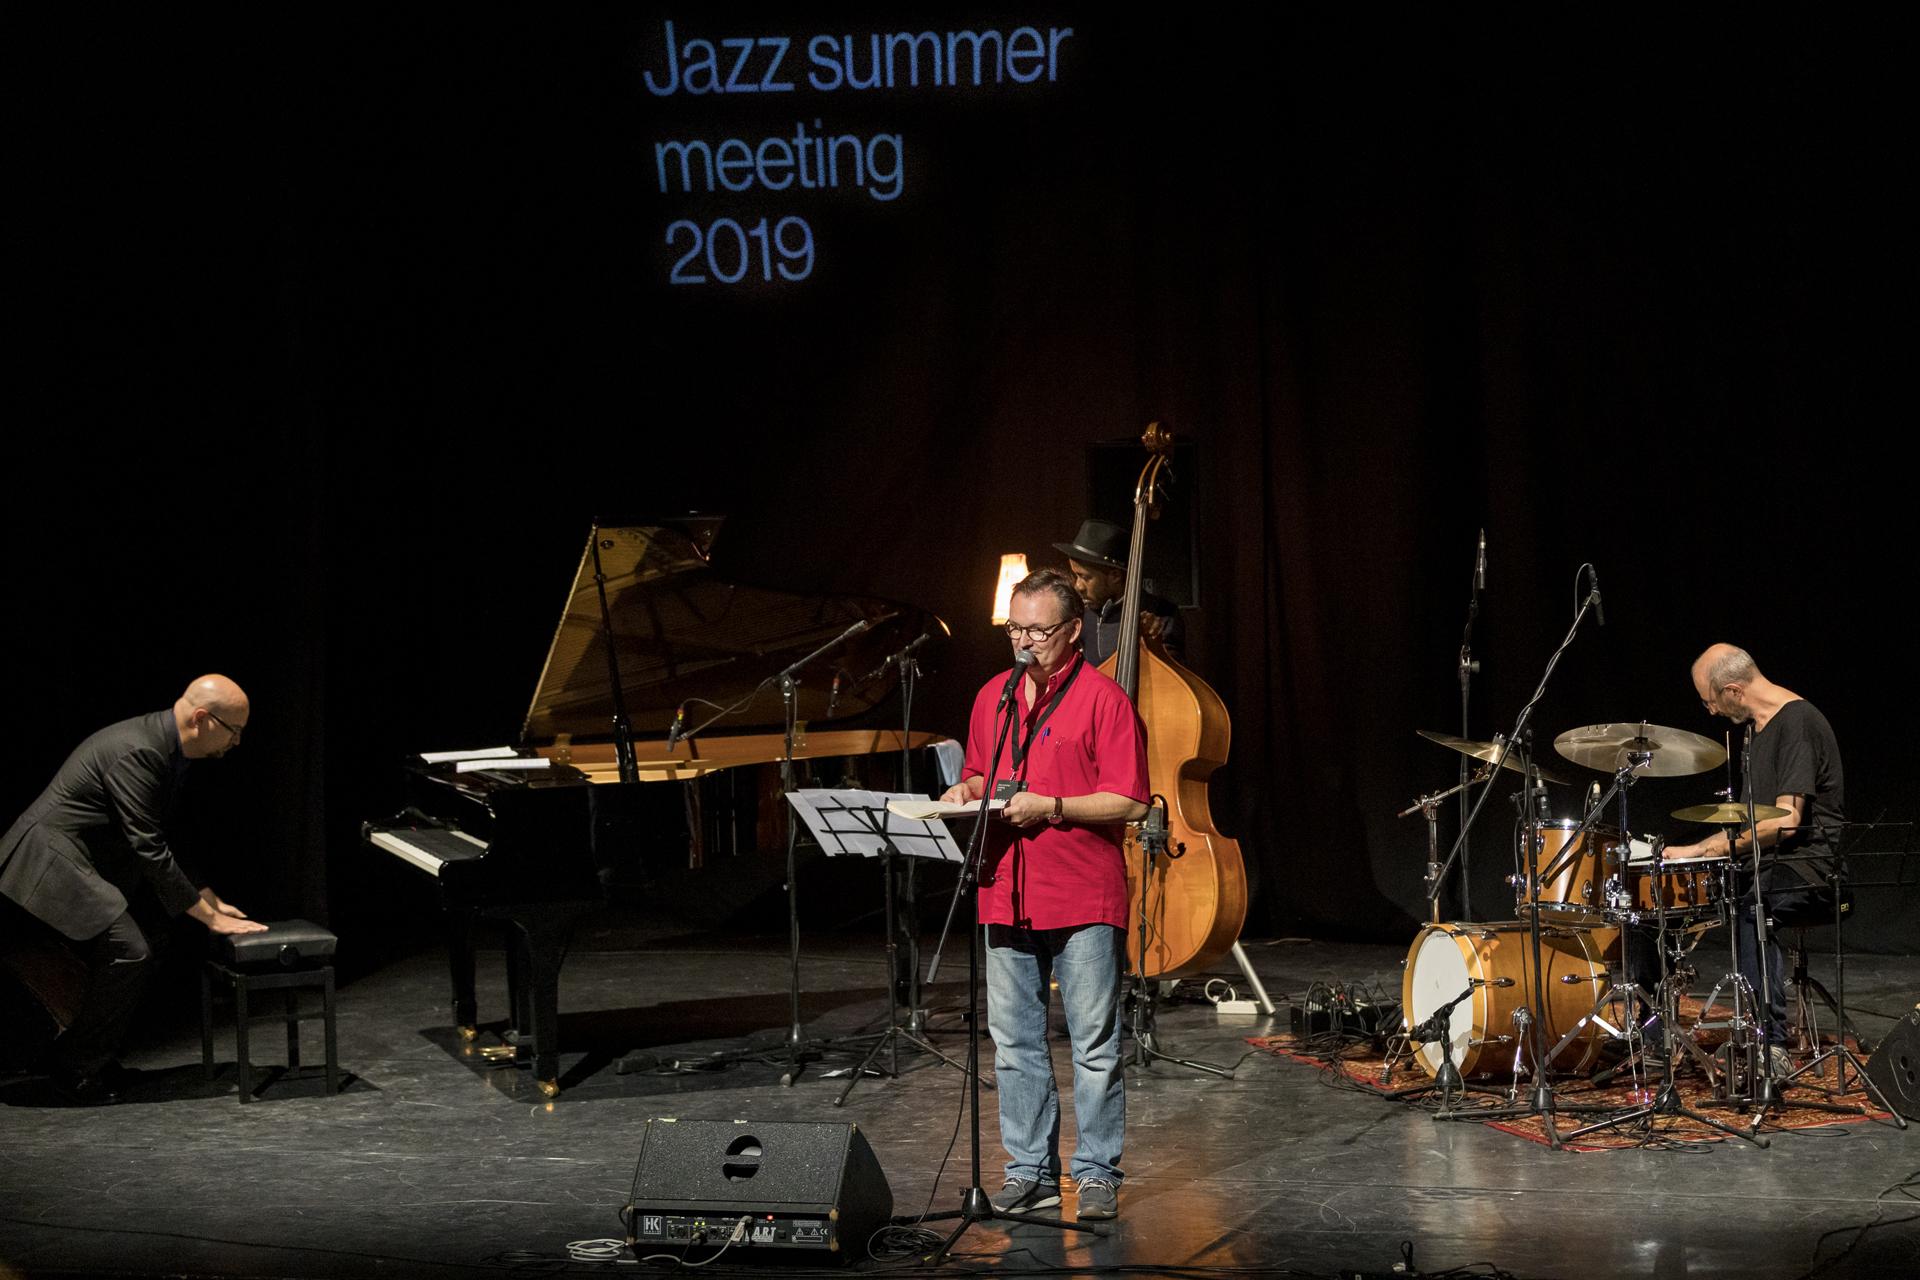 2019_09_13-Iverson-Sanders-Rossy-Trio-©-Luca-Vantusso-225253-EOSR6729